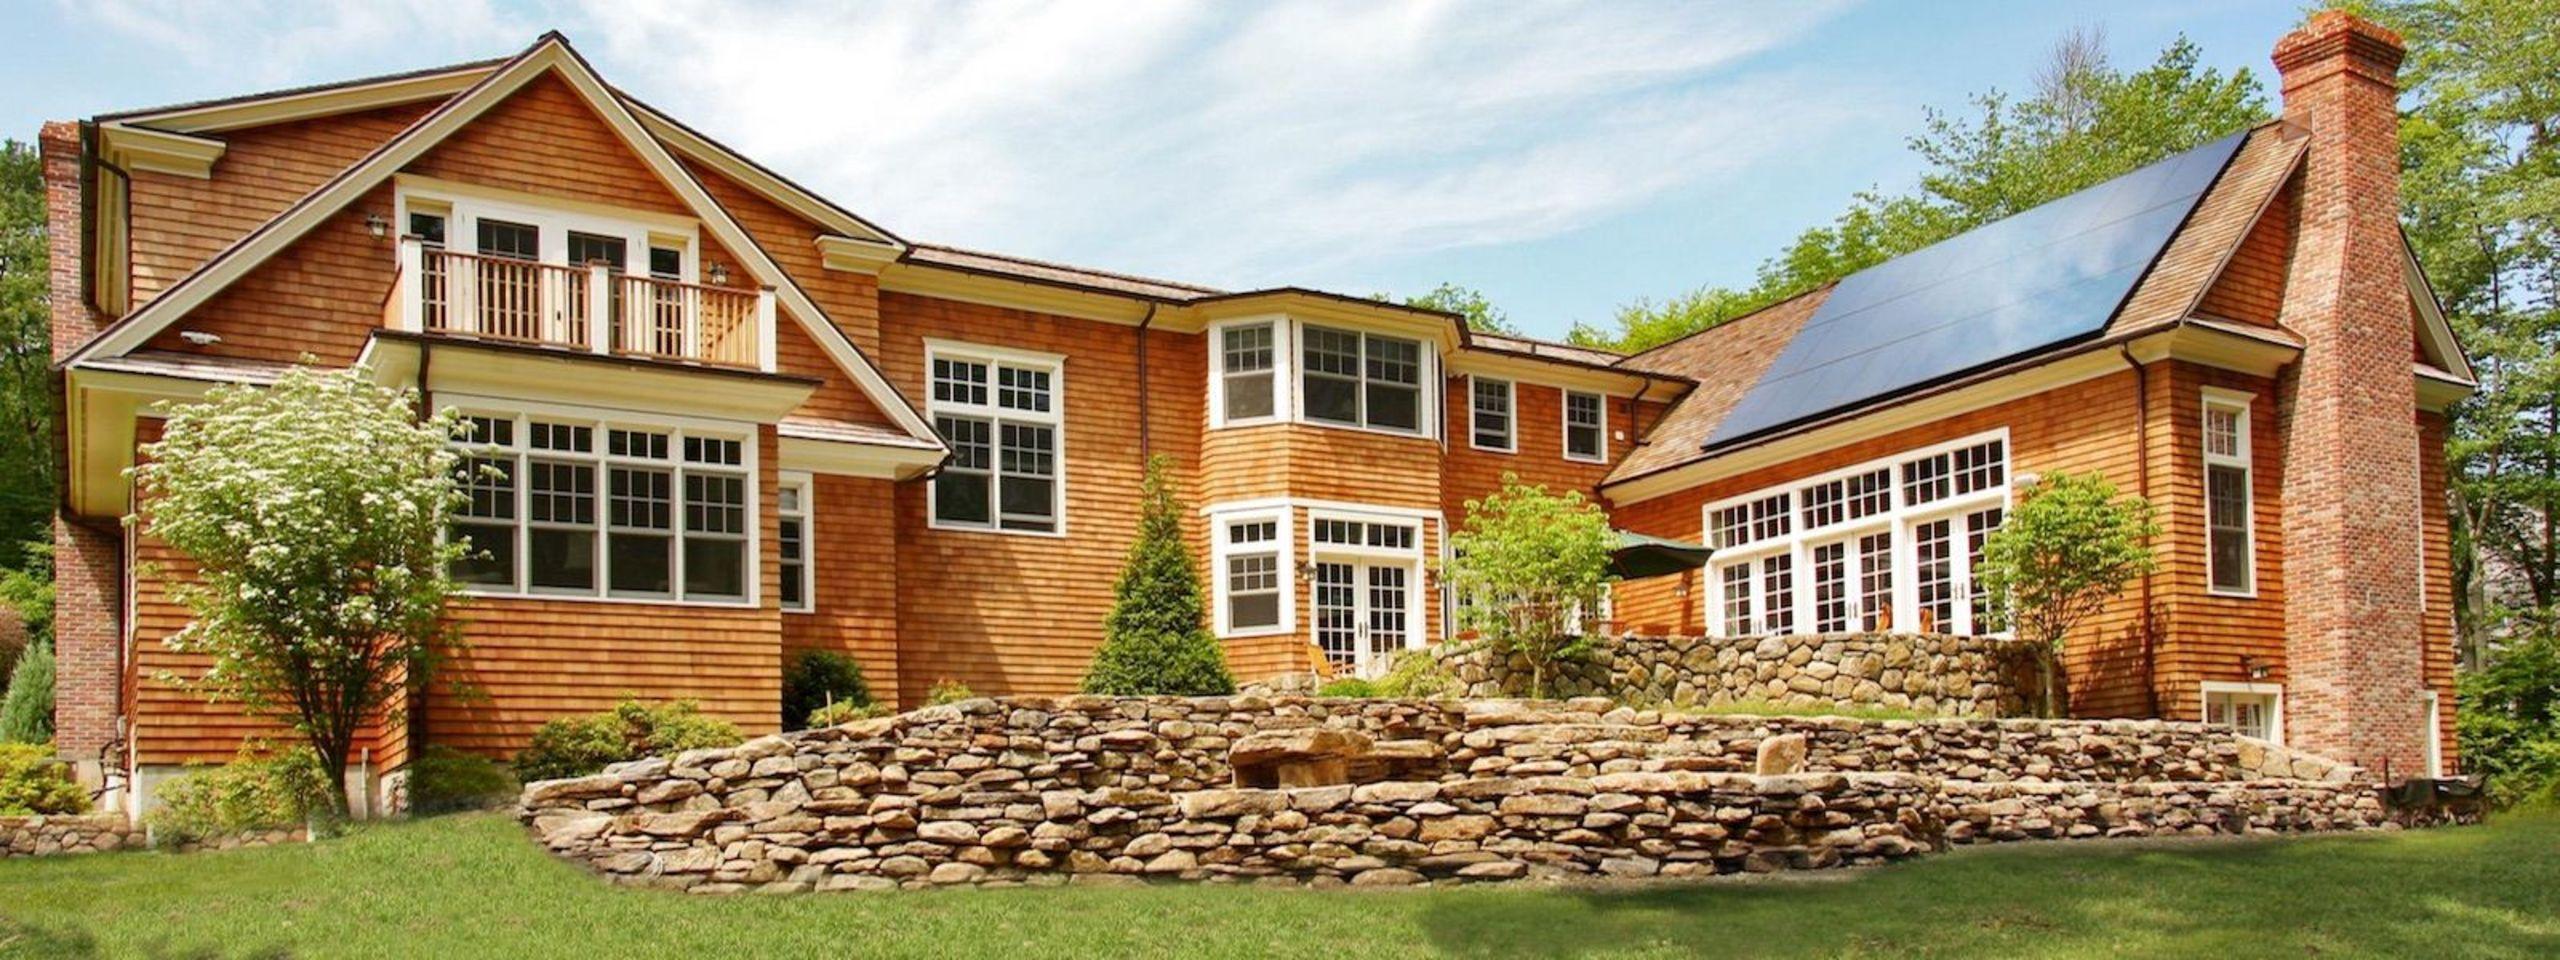 Westport CT Homes For Sale | Michael Teng at Keller Williams